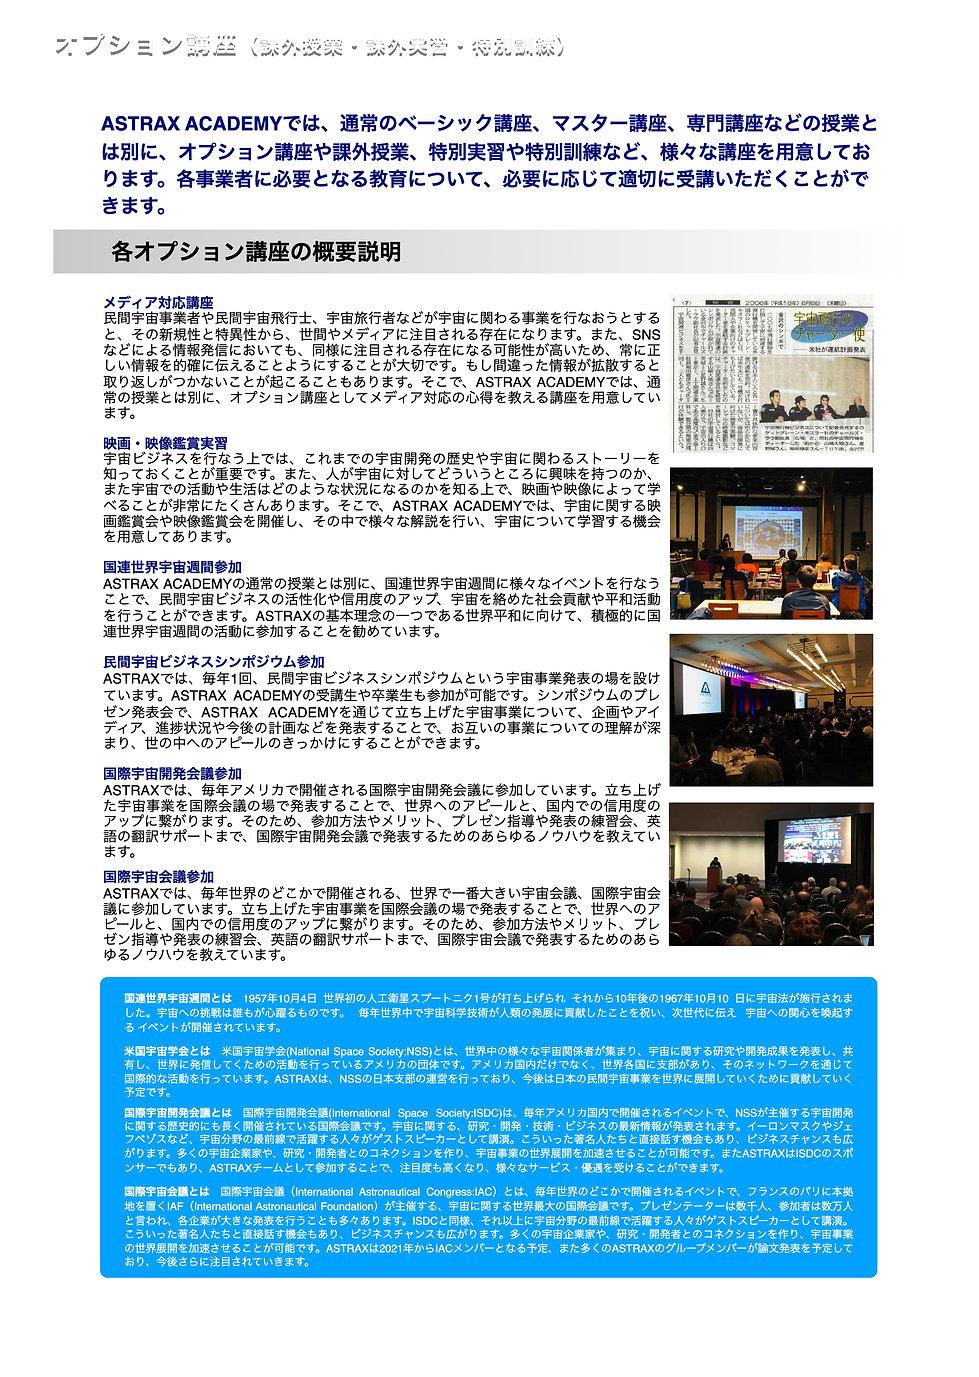 ASTRAX ACADEMYパンフサイト用_20210615.009.jpeg